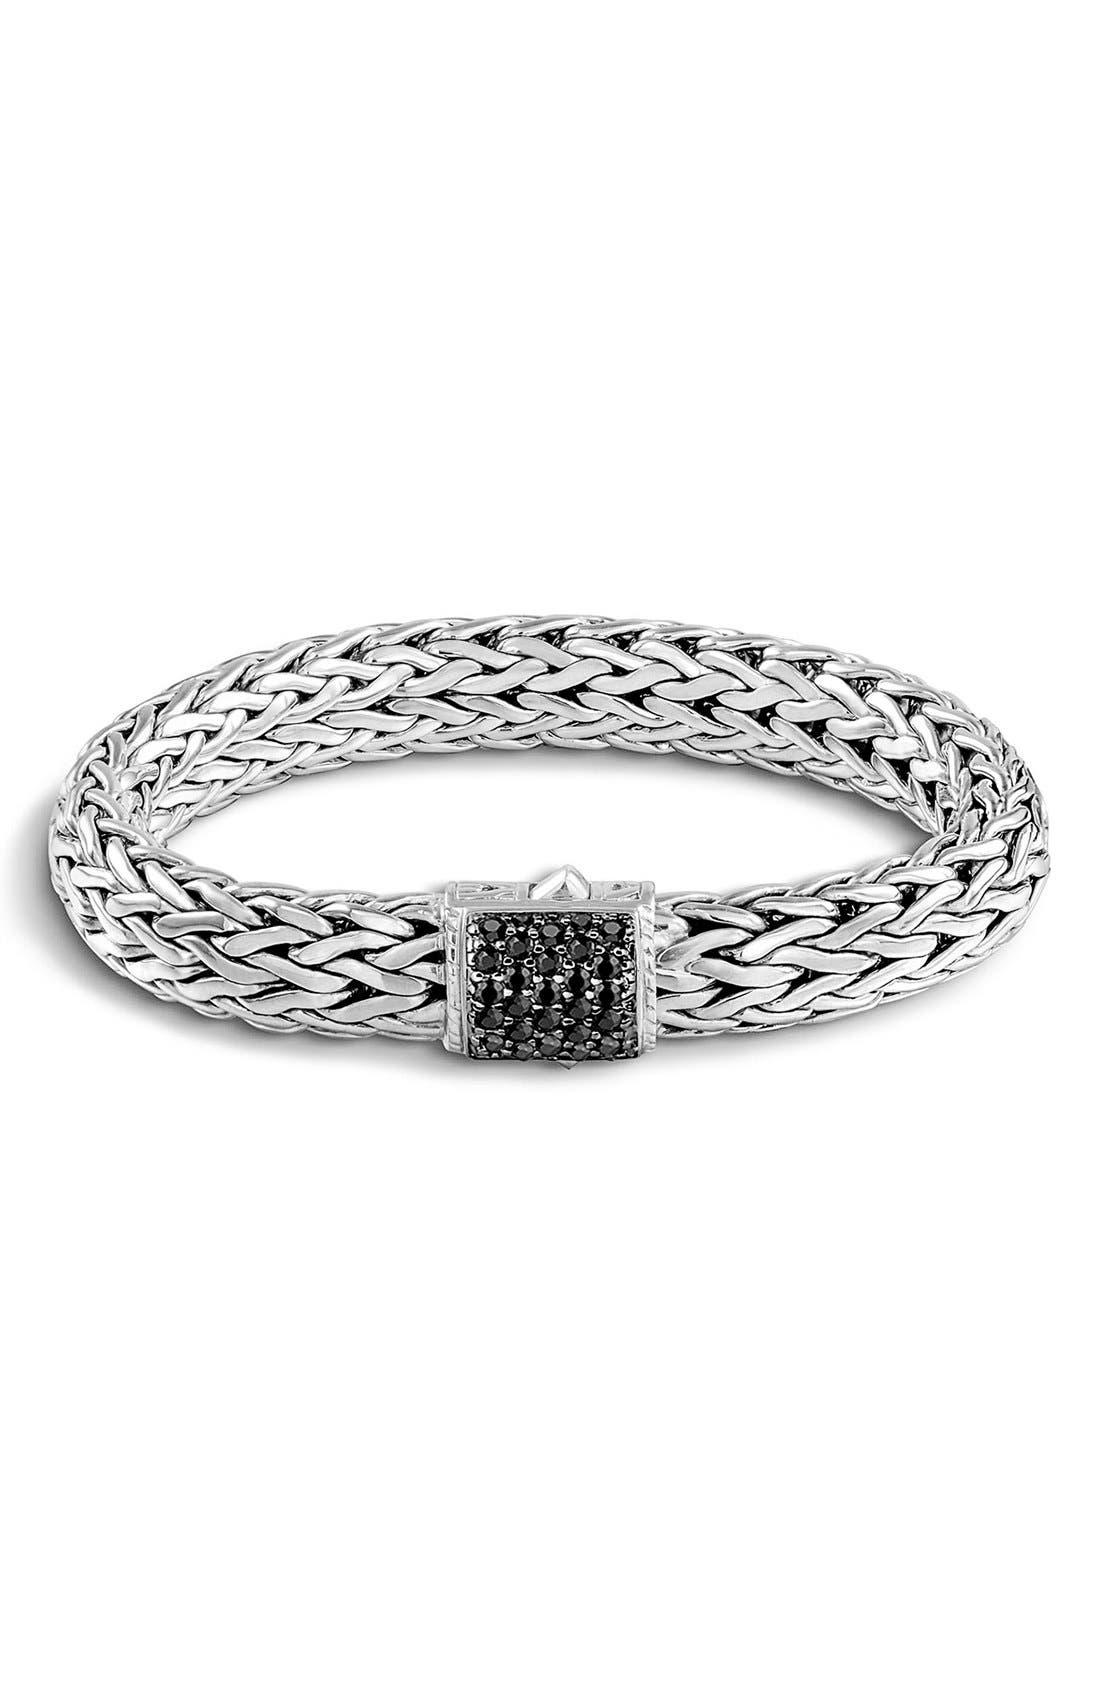 Alternate Image 1 Selected - John Hardy 'Classic Chain' Large Bracelet